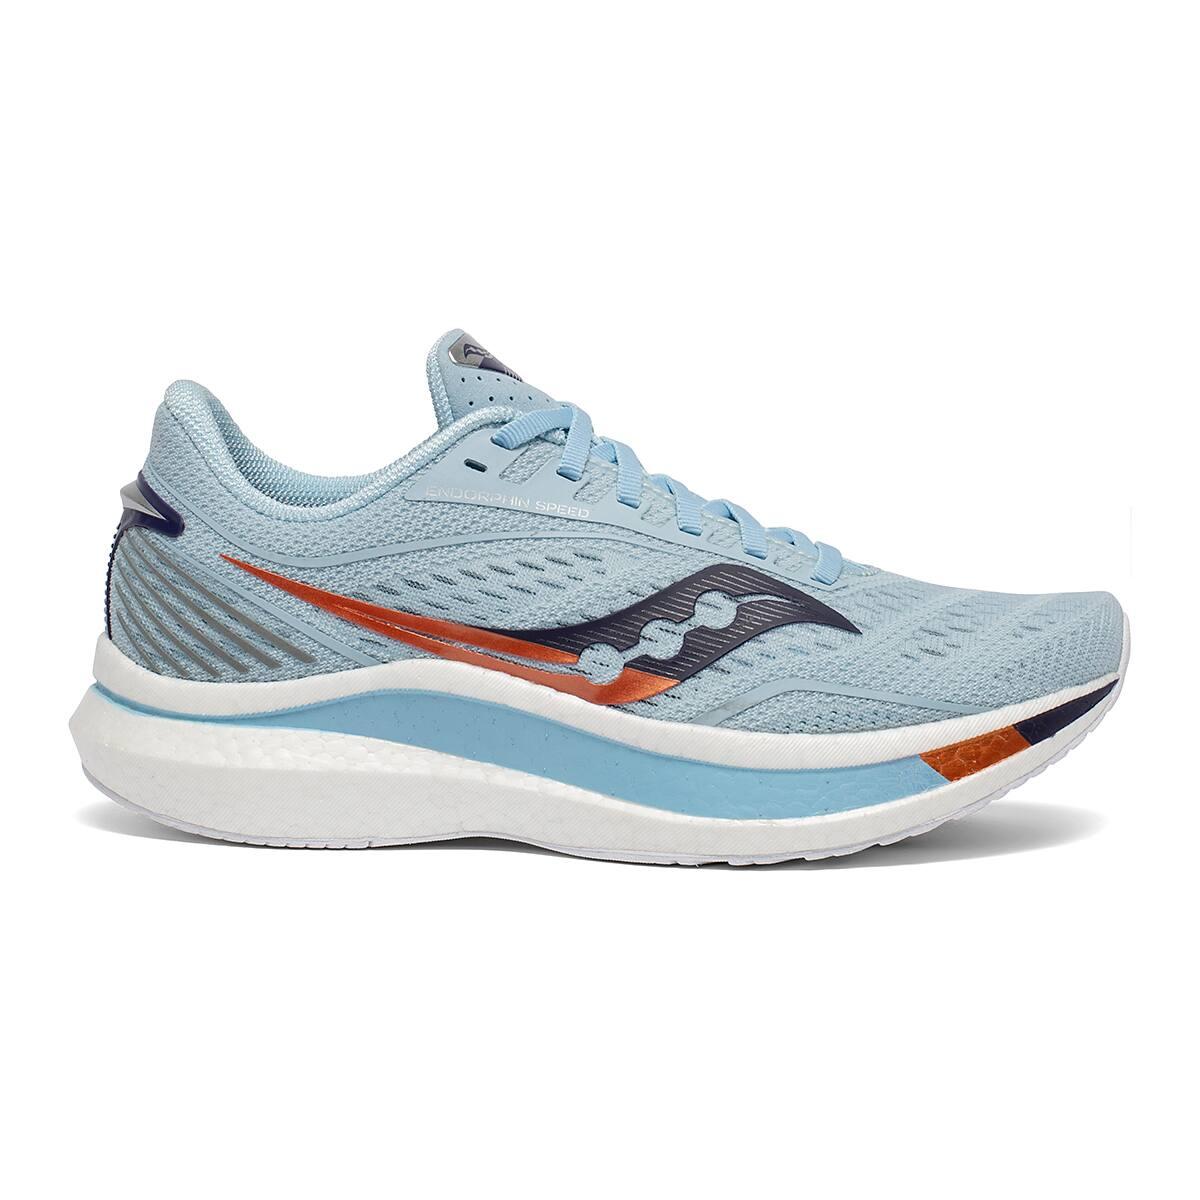 Saucony Endorphin Speed Running Shoe $89.98 w/Free S/H